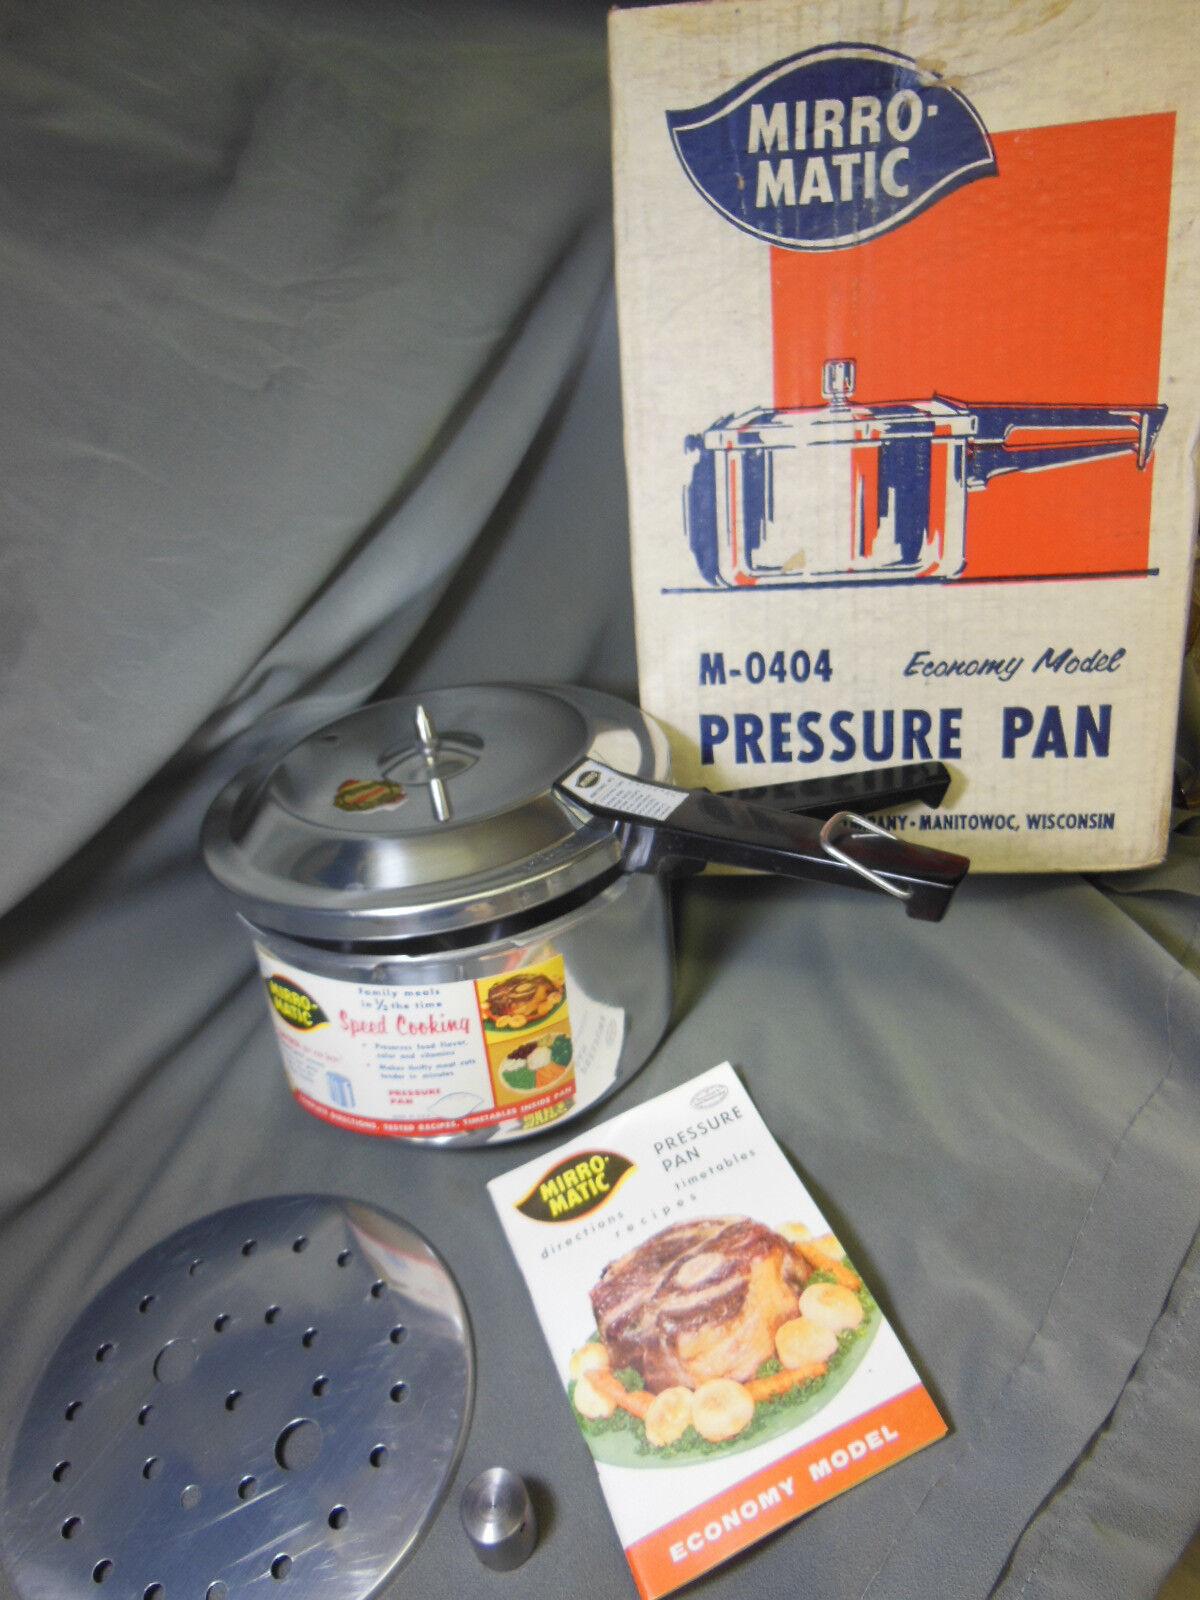 Mirro-Matic M-0404 PRESSURE PAN Economy Model w  Instructions  NOS 1961  NEW